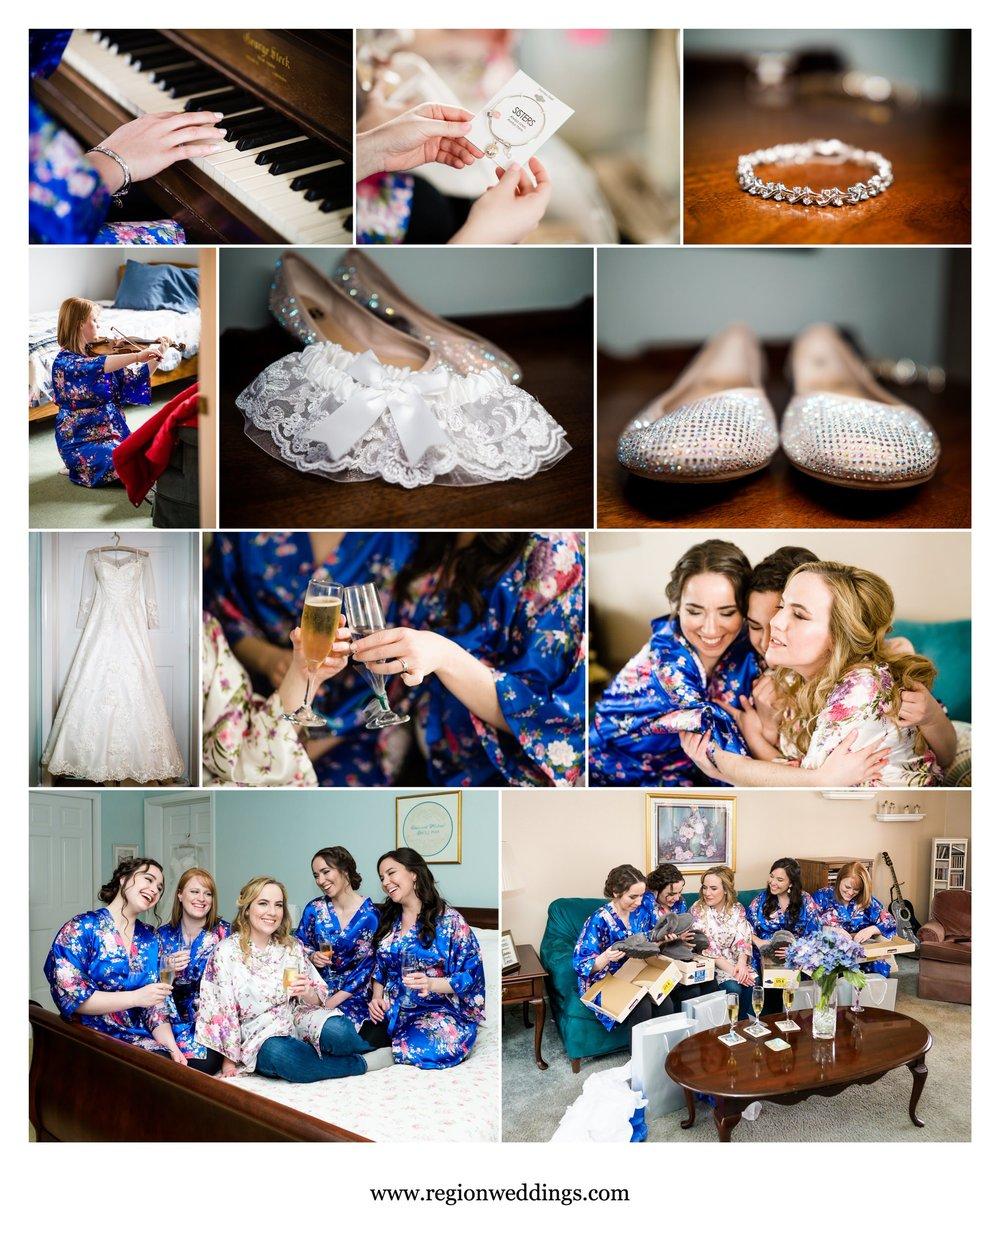 Bridal prep for a winter wedding.